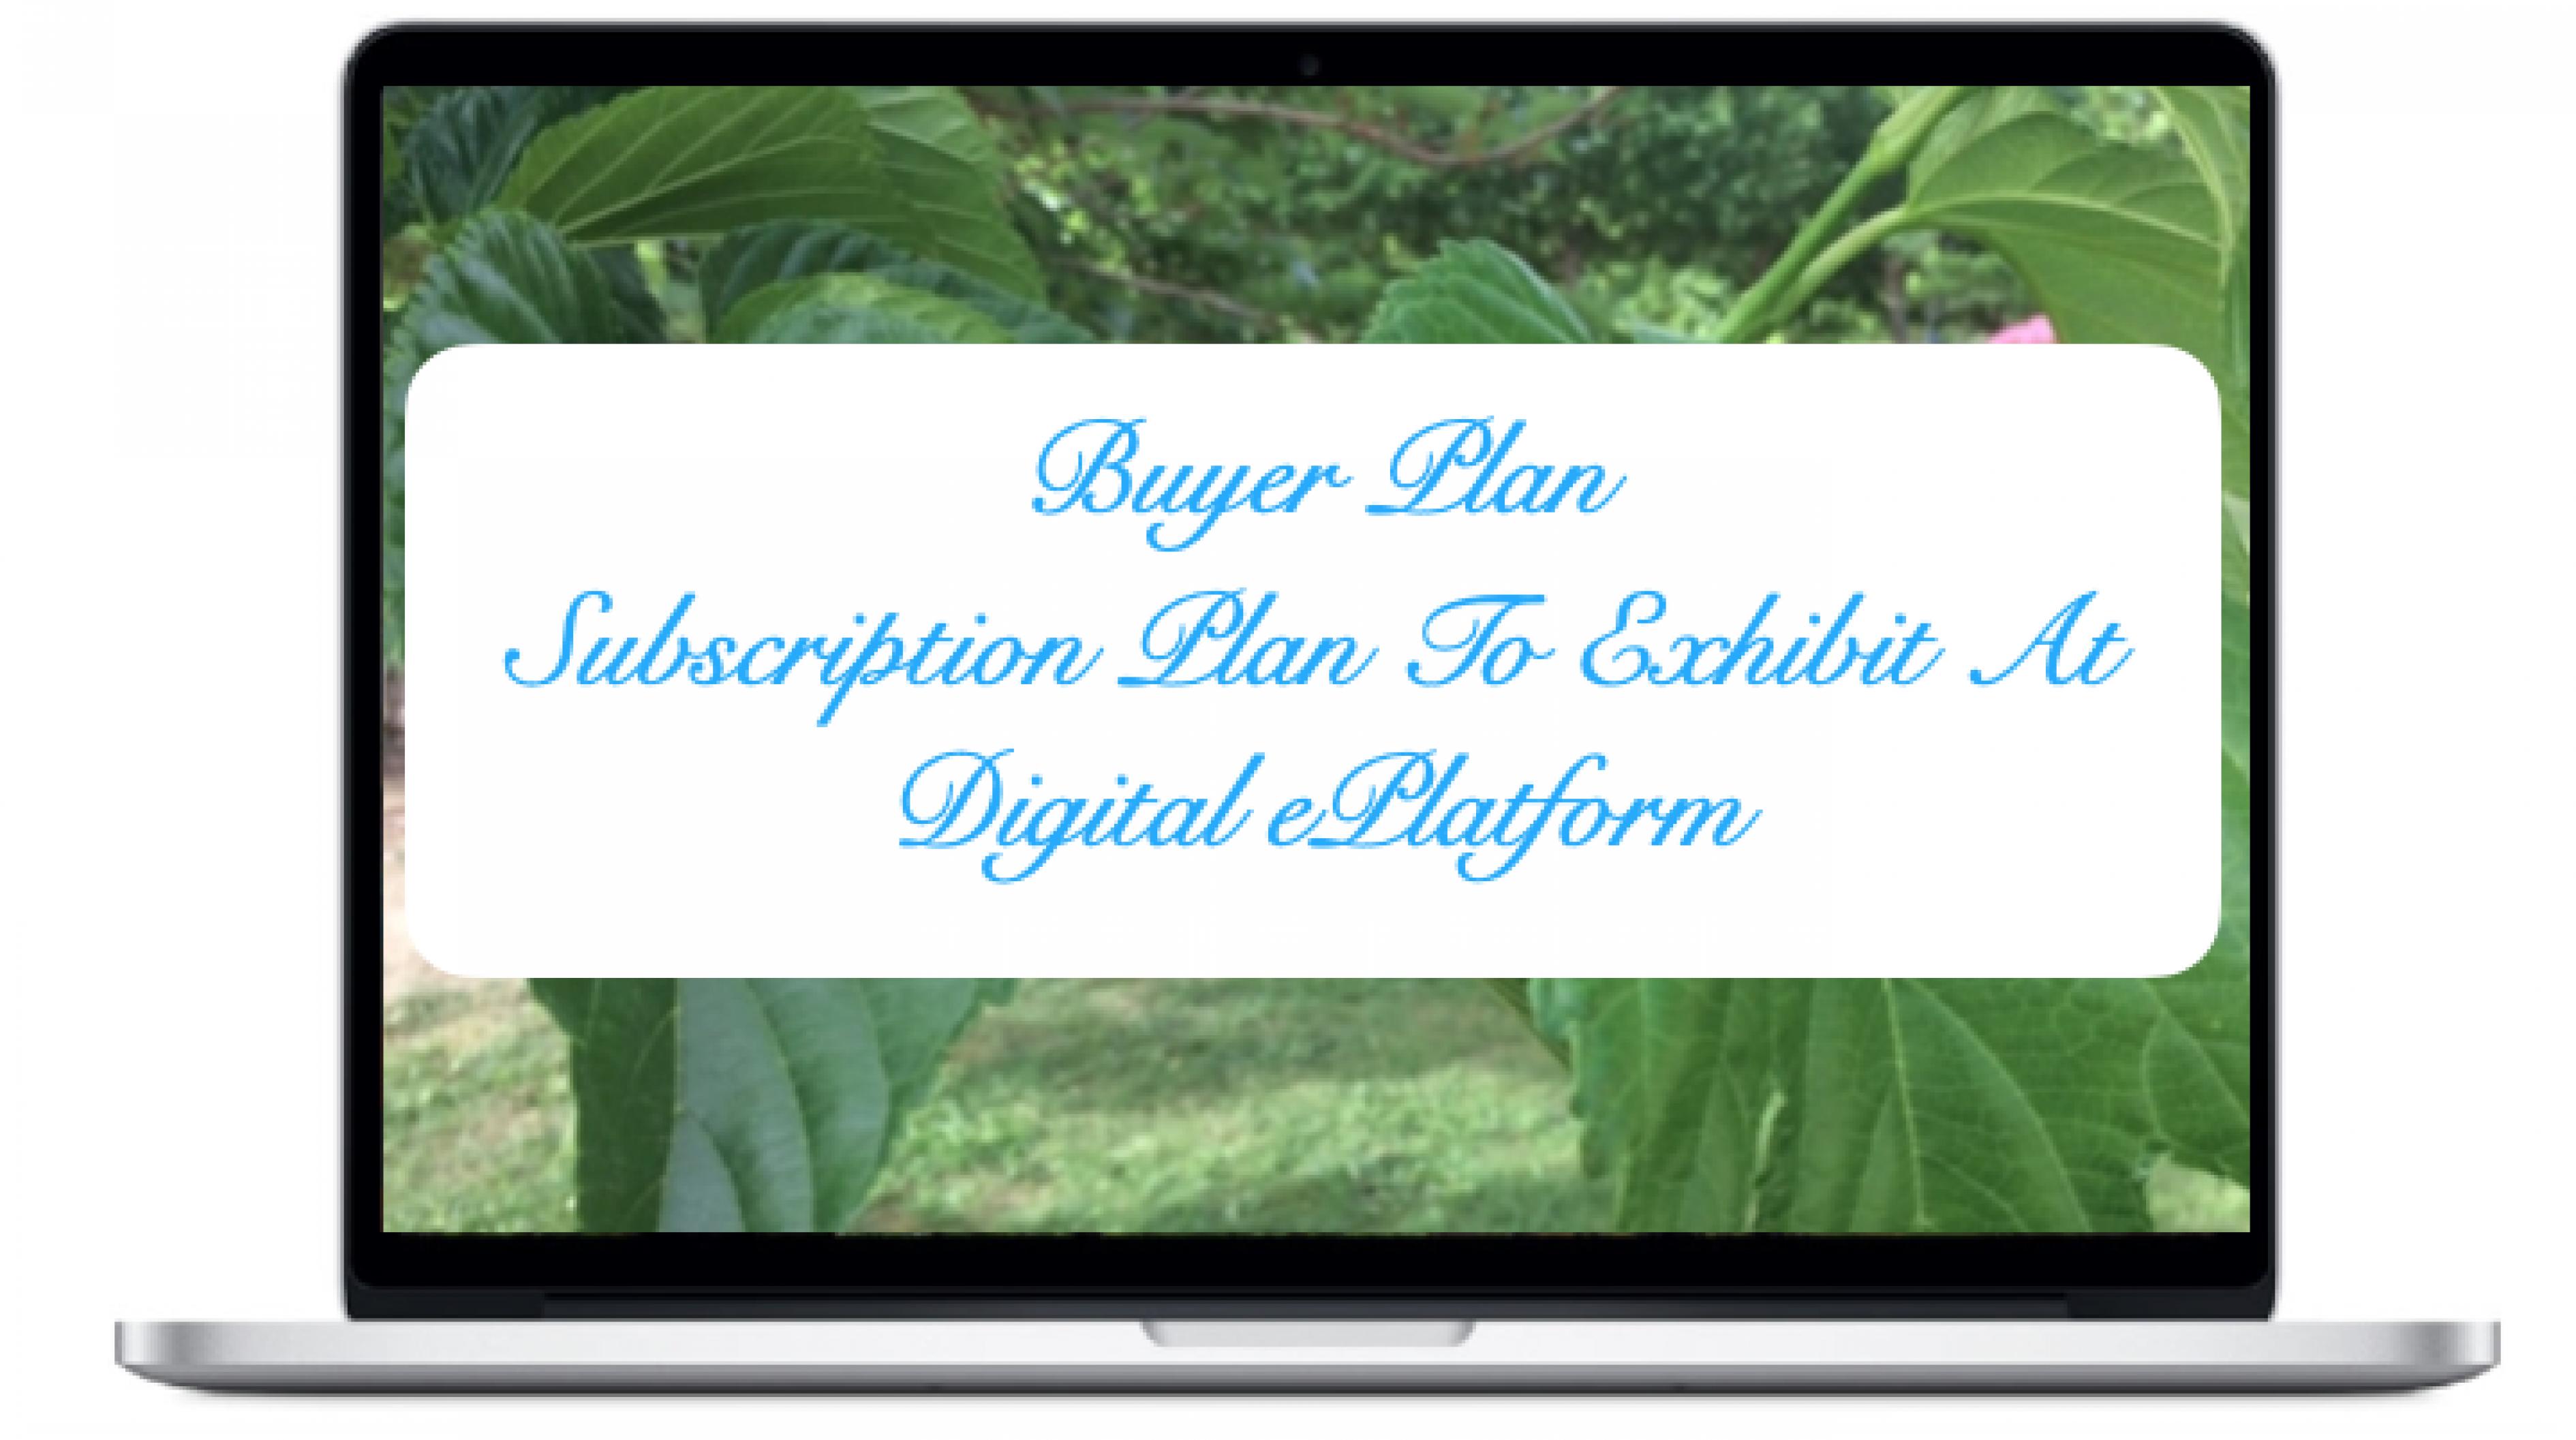 buyer-subscription-plan-to-exhibit-at-digital-eplatform